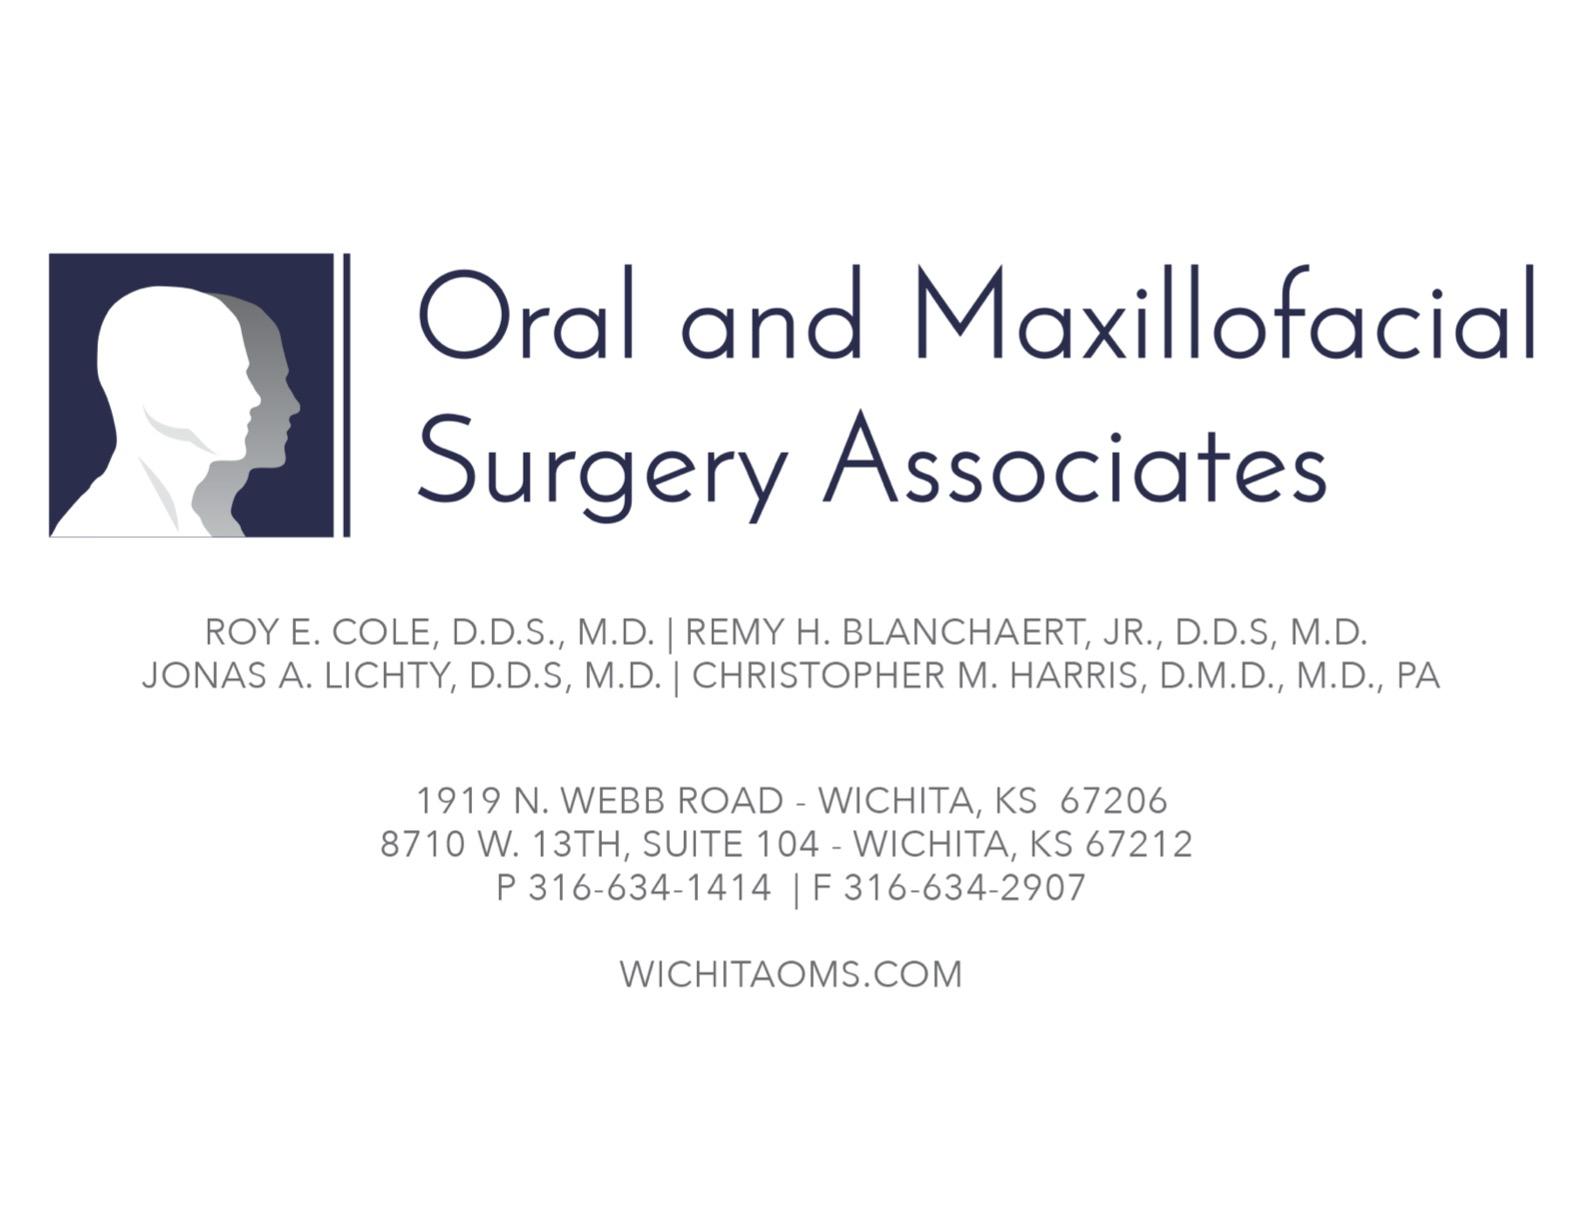 MVP Sponsors - Oral and Maxillofacial Surgery Associates - Logo